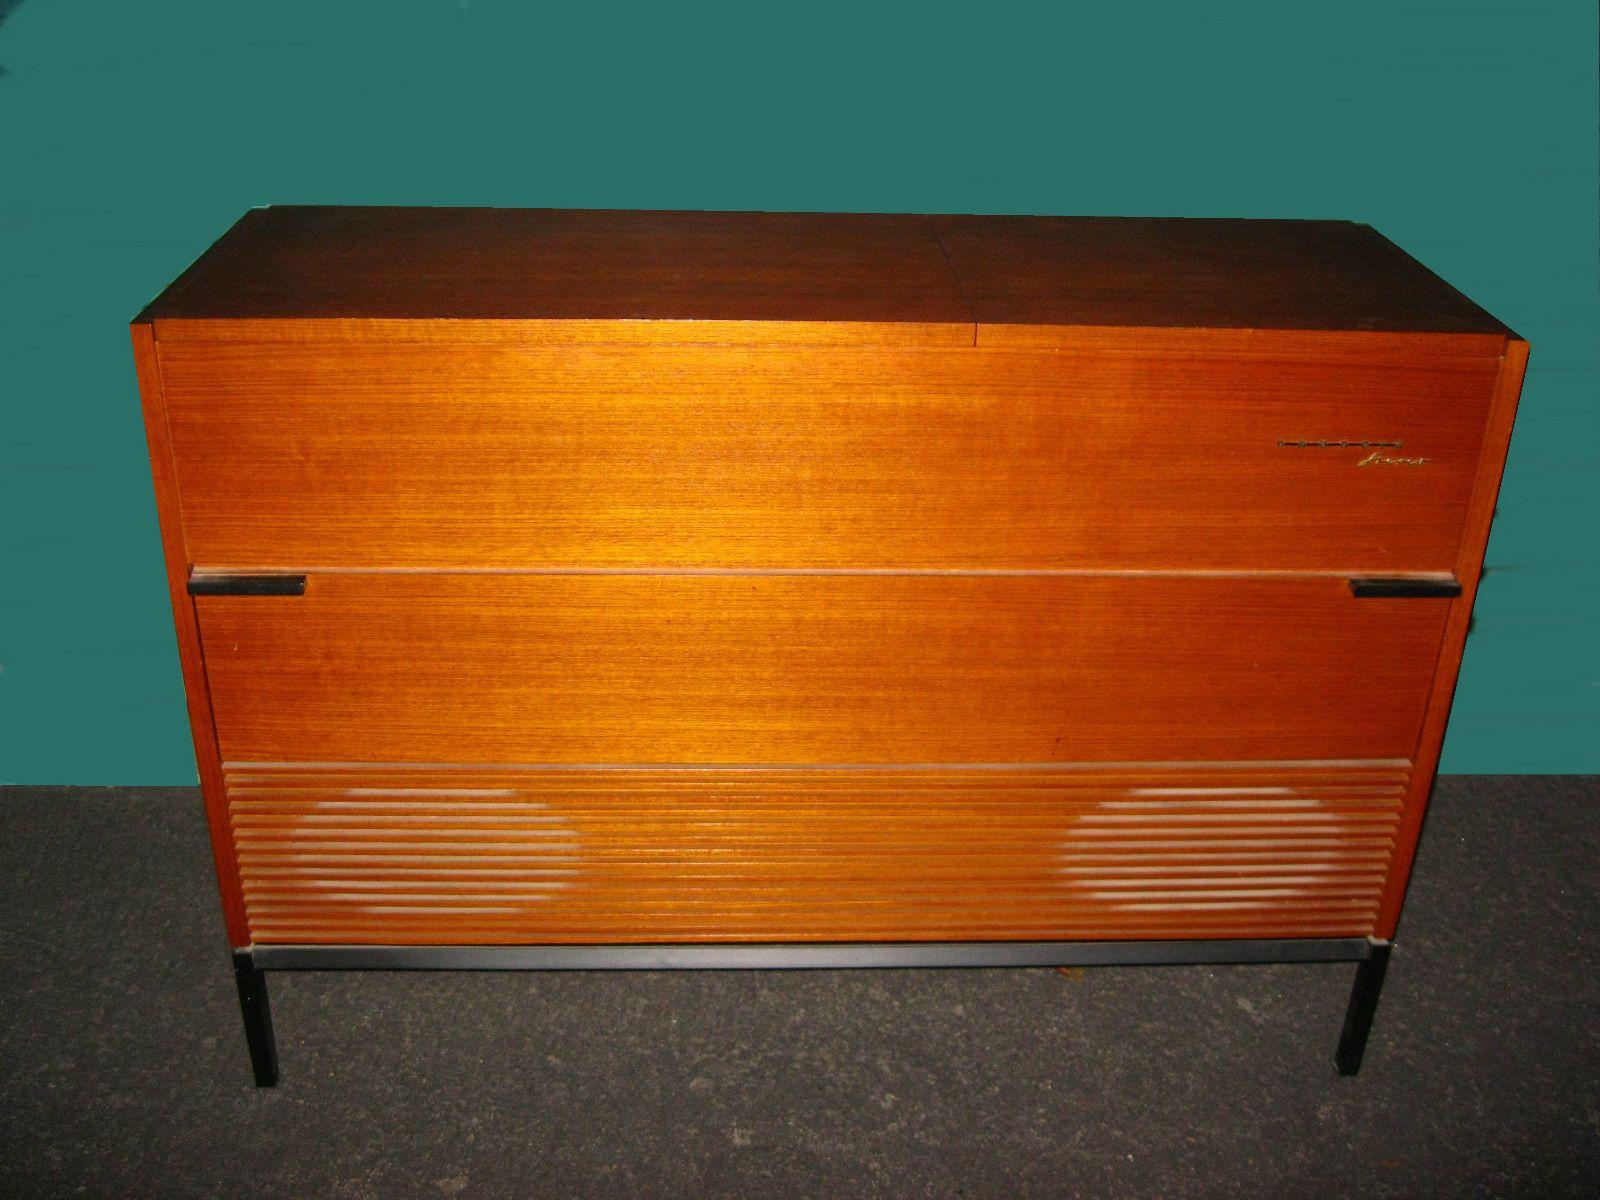 Grundig Stereo Radio Console Wood Cabinet W Vinyl Record Player